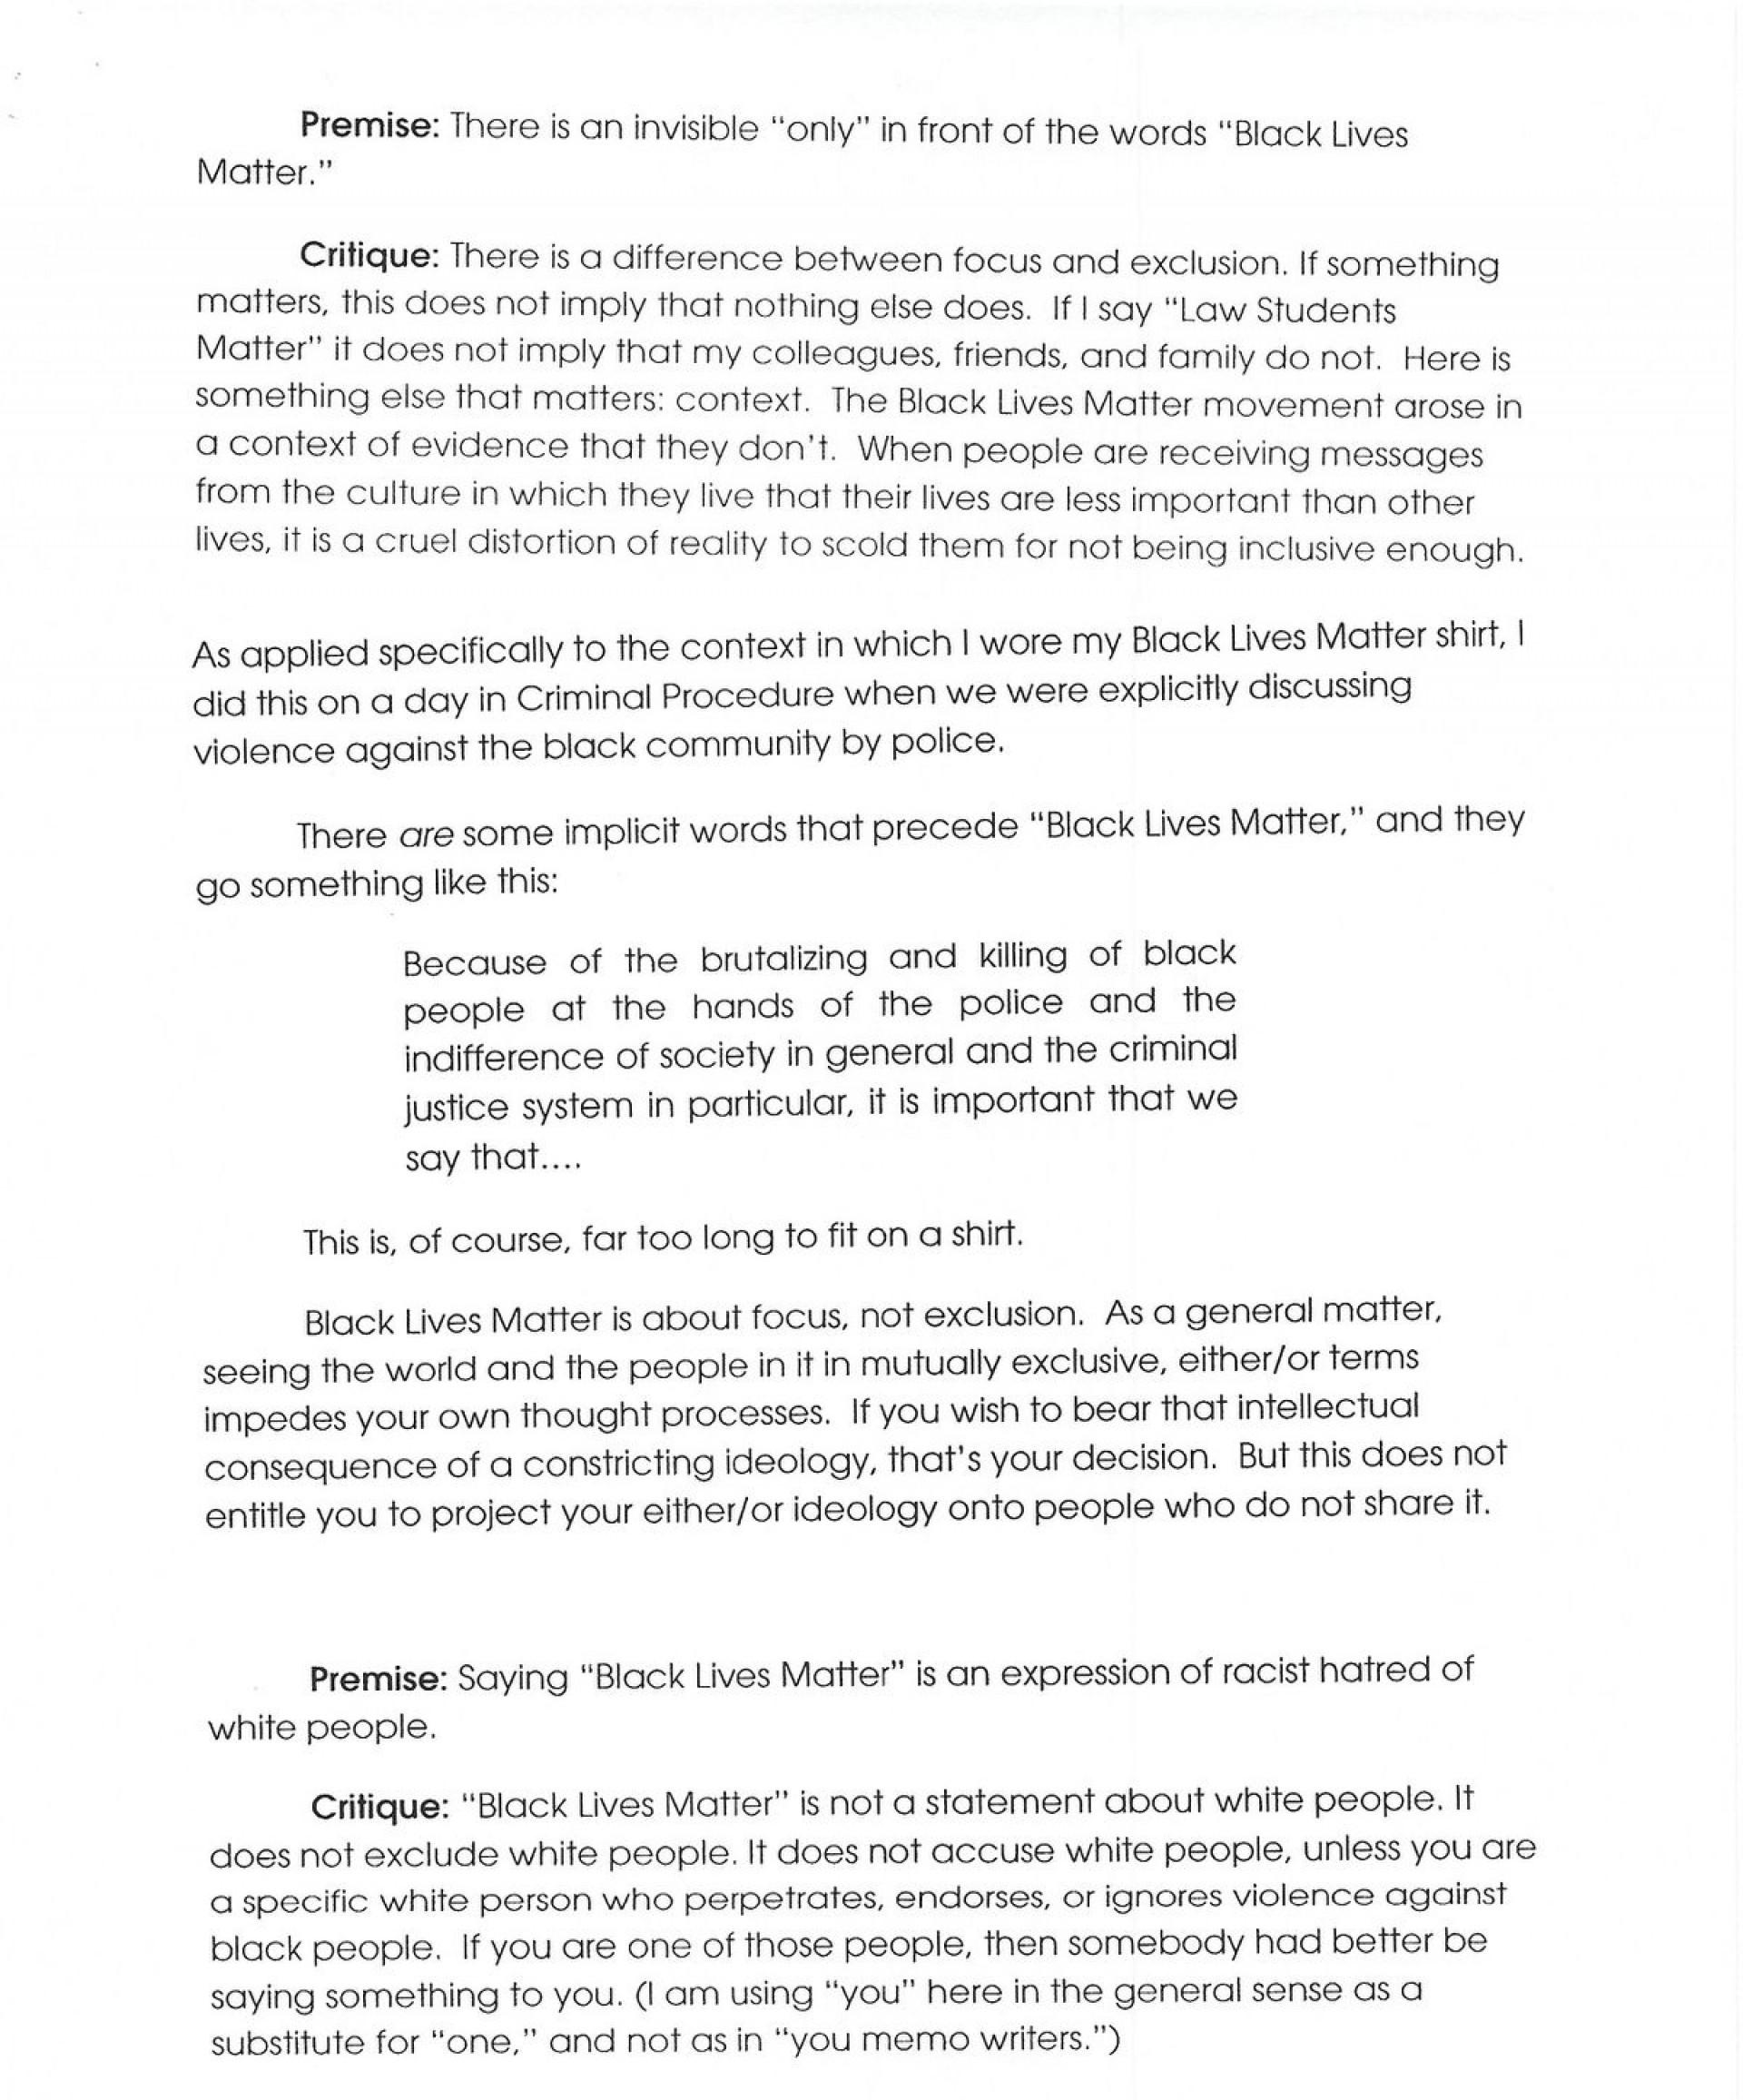 003 Black Lives Matter Essay Thesis Example Impressive 1920